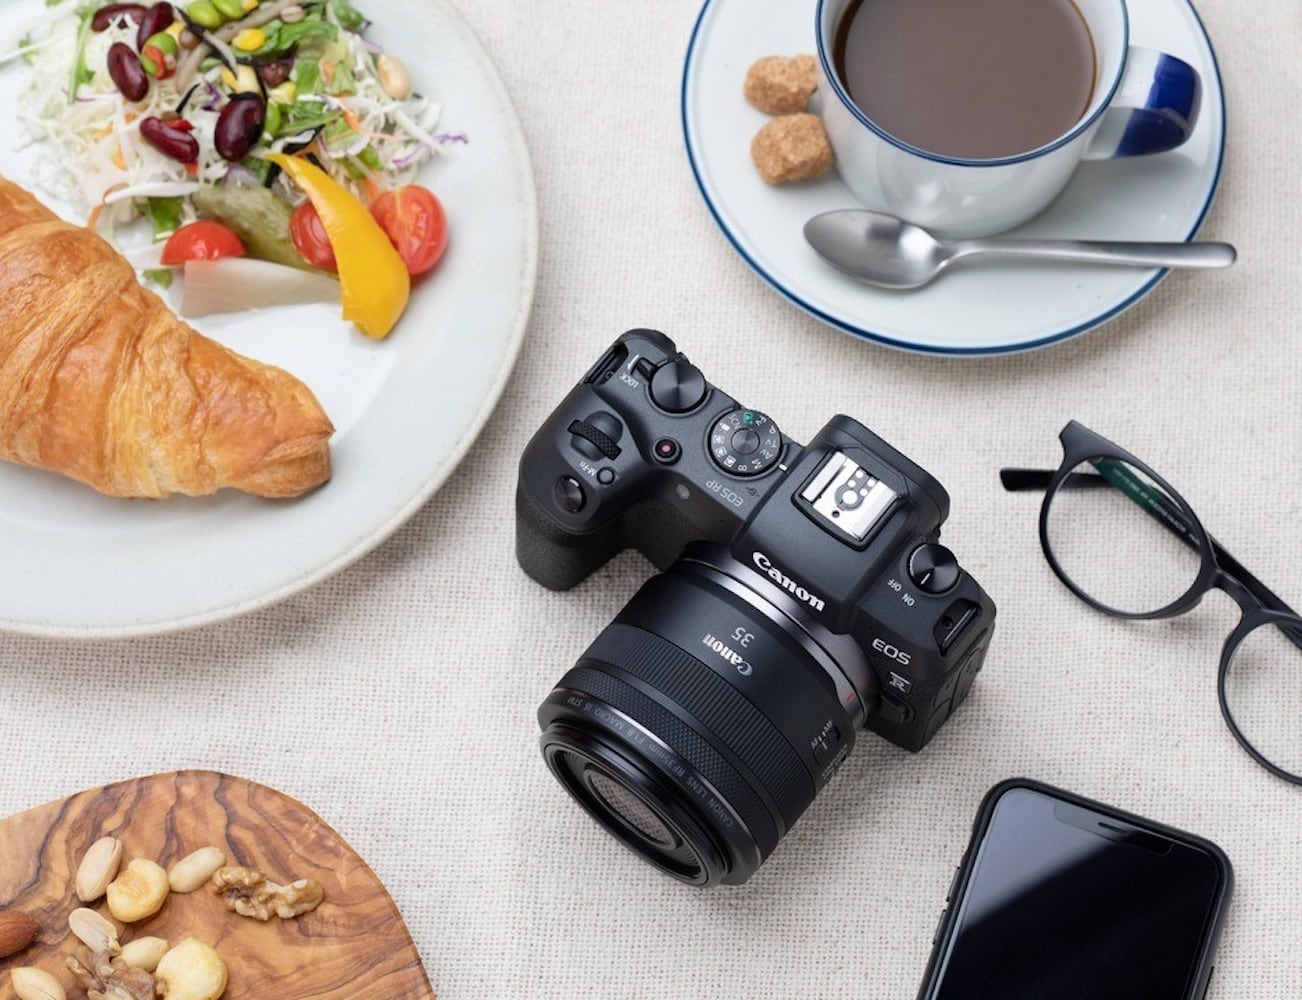 Canon EOS RP Full-Frame Mirrorless Camera packs incredible power